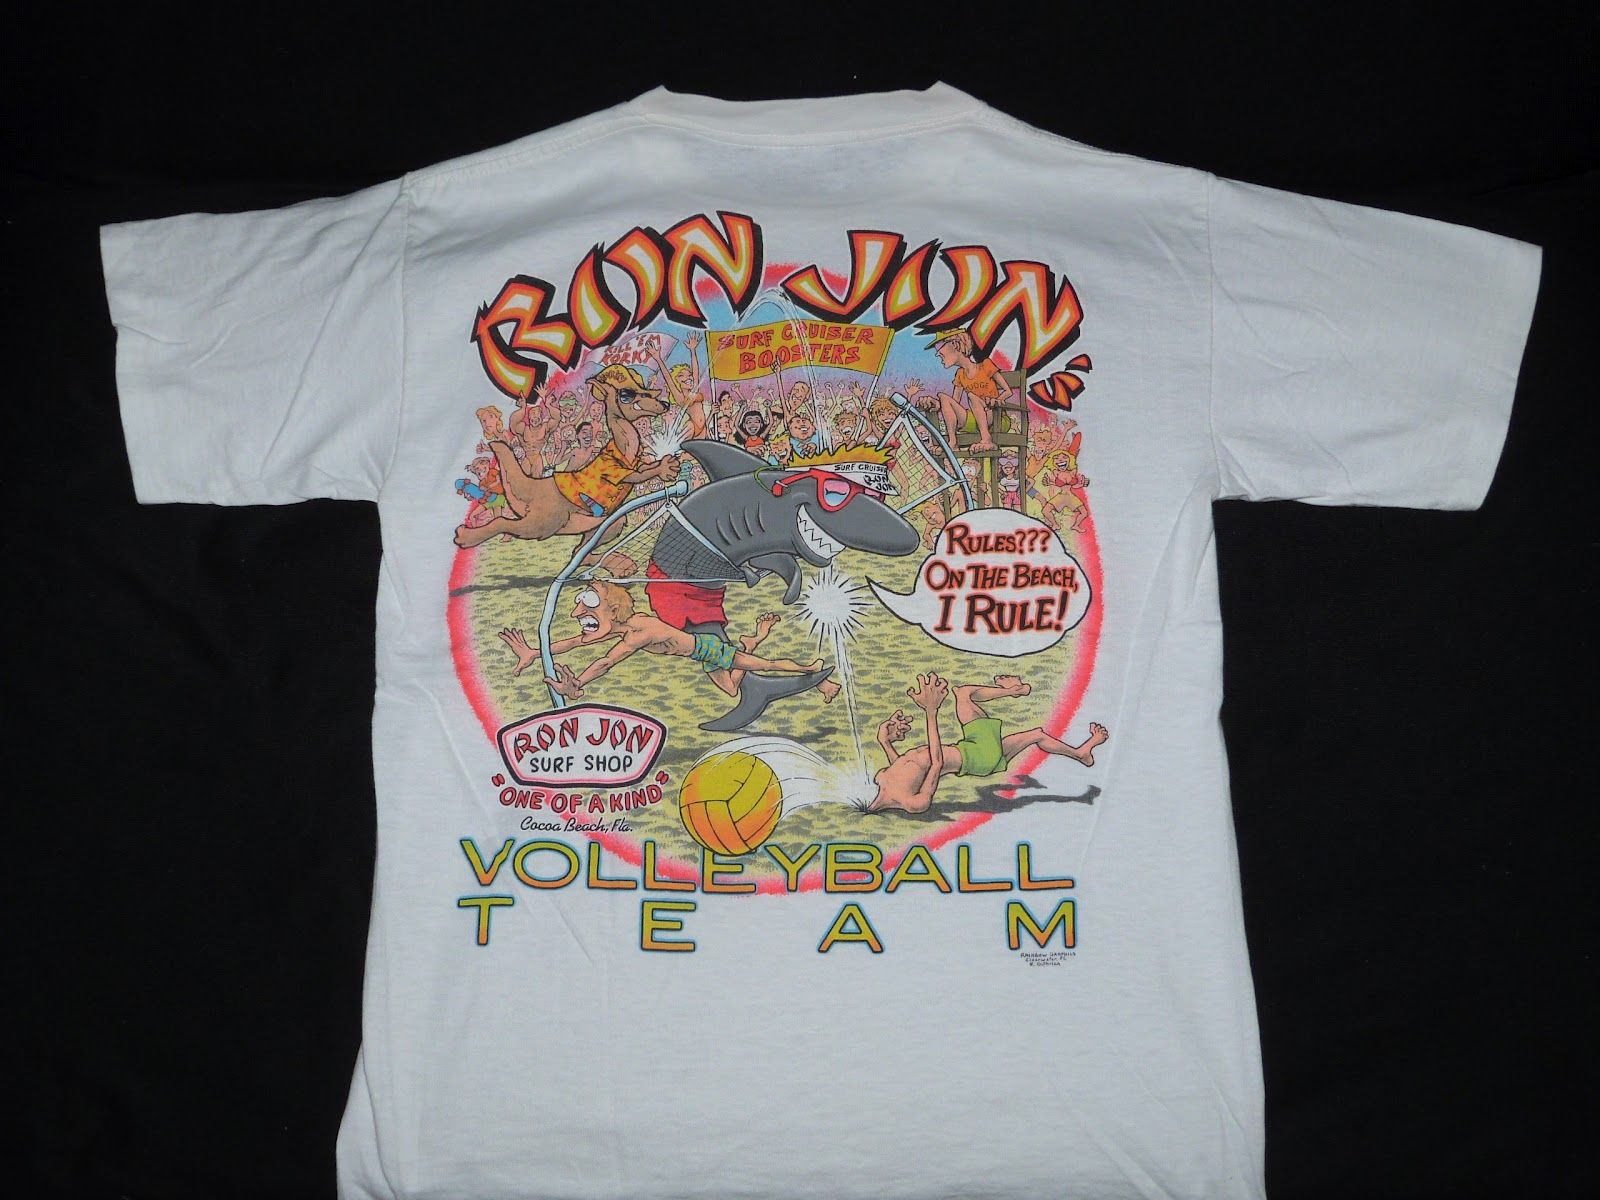 Surfing Shirts Fifty2weekhi Vintage 80 S Ron Jon Surf Cocoa Beach Fla T Shirt